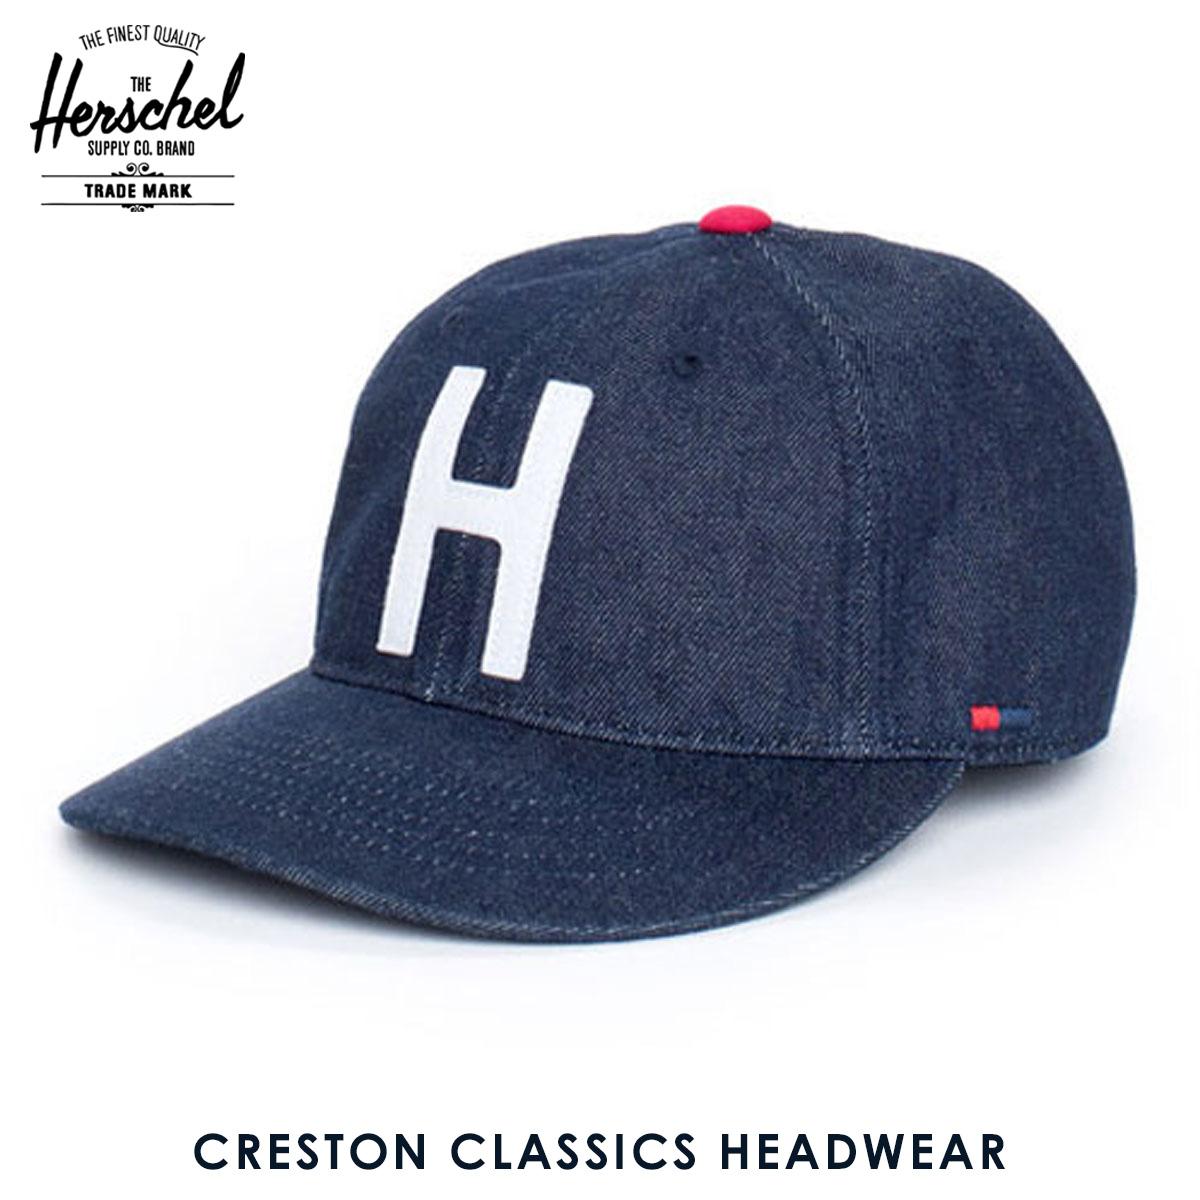 2ca803fefe3 Rakuten Ichiba shop MIXON  25%OFF sale Hershel supply Herschel Supply  regular store cap Creston M L Classics Headwear 1023-0031-ML Selvedge Denim  D15S25 ...